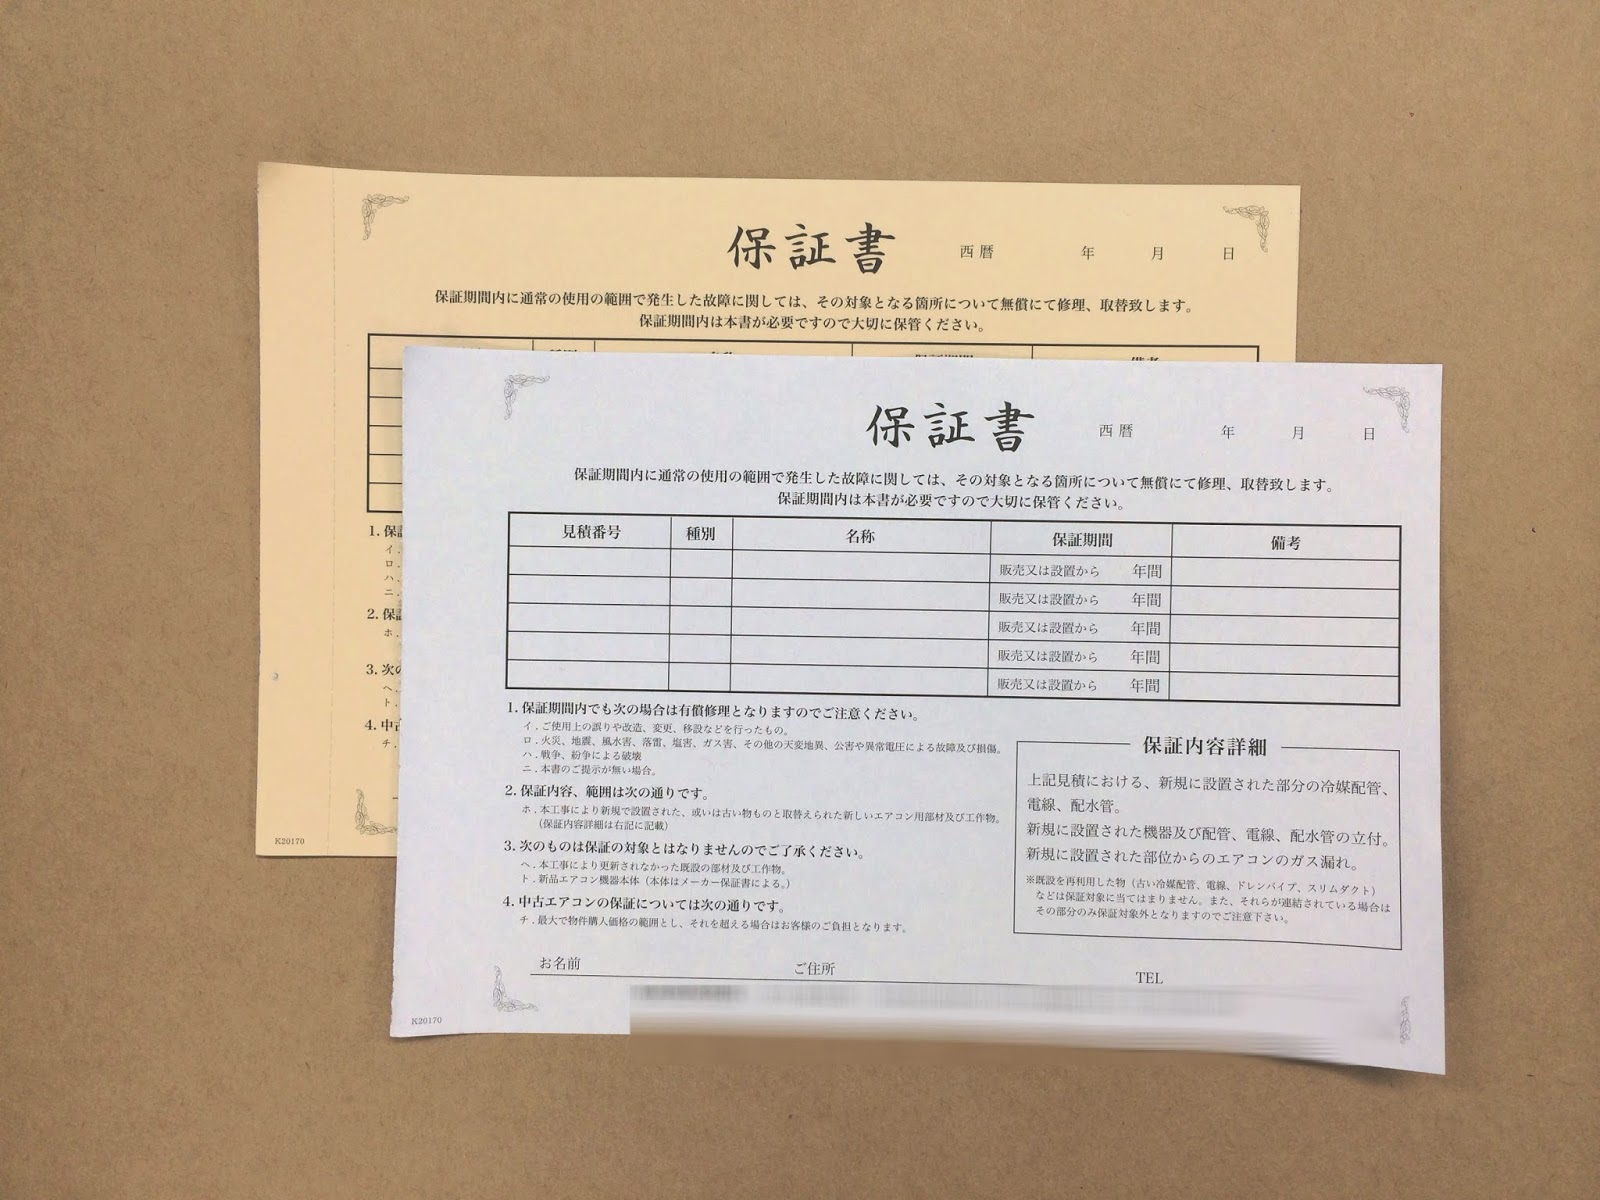 2枚複写、電気設備業向け「保証書」